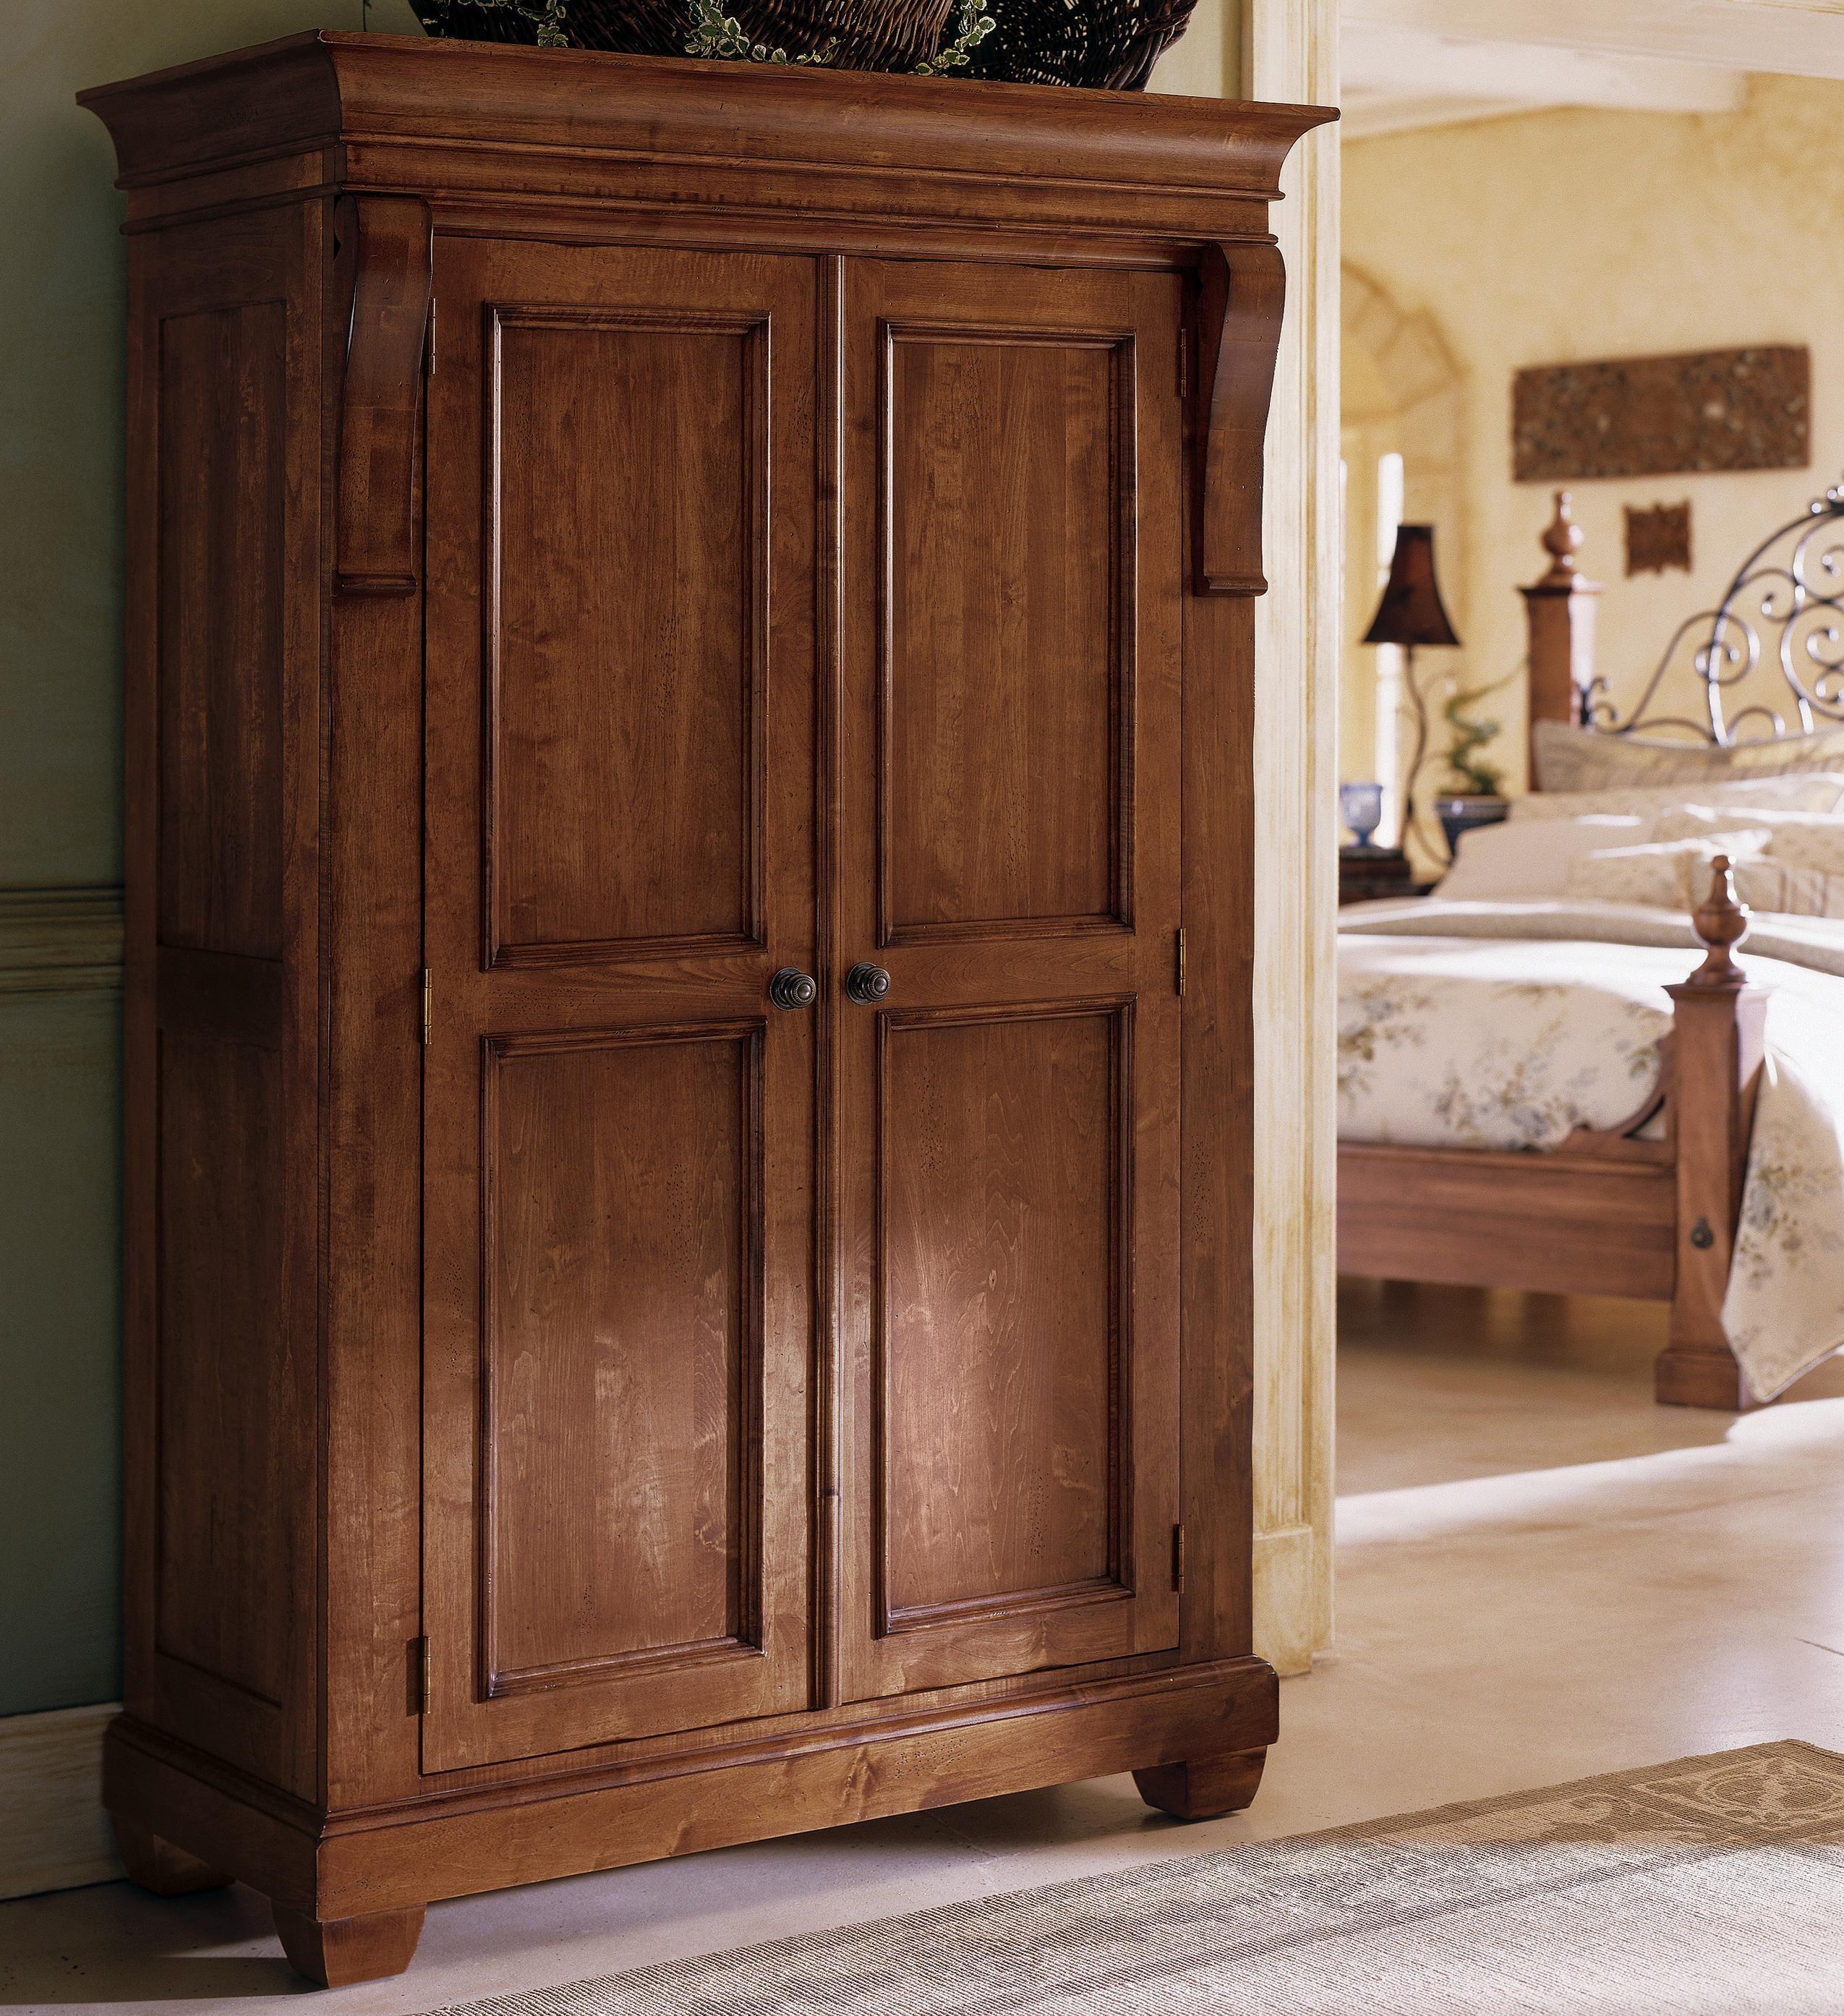 Tuscano Wardrobe Armoire By Kincaid Furniture I Need It